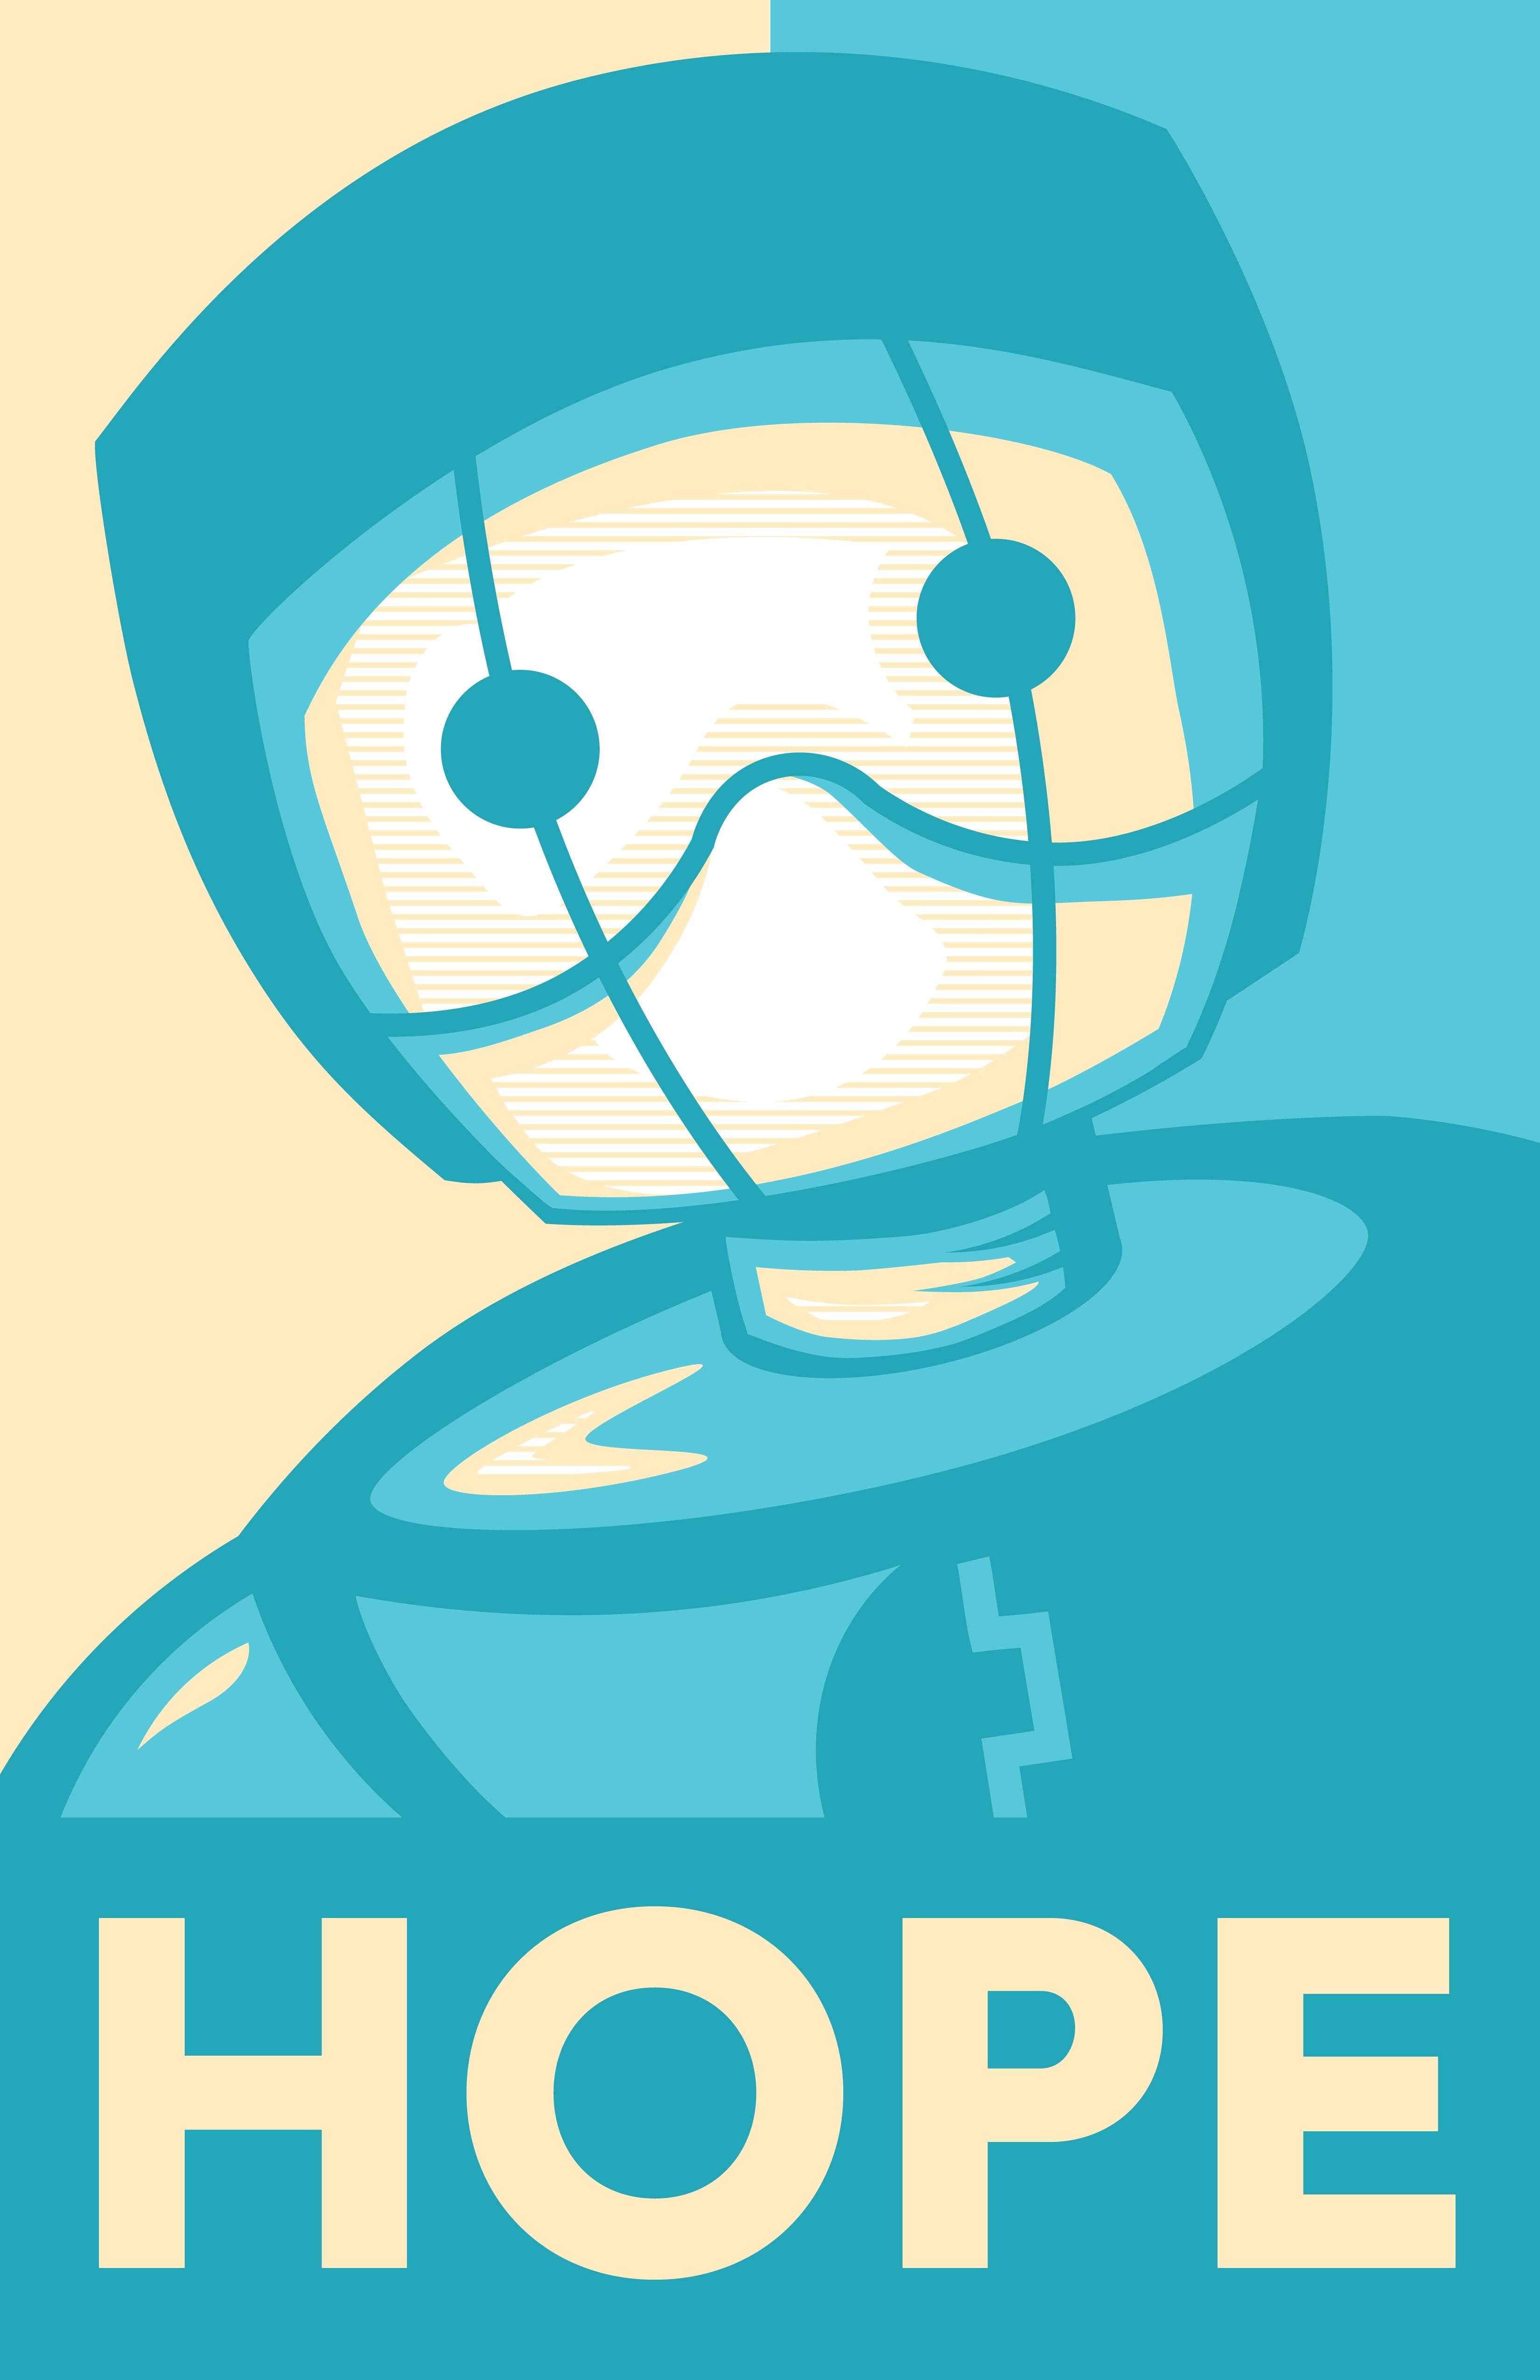 Motivational Poster - Hope